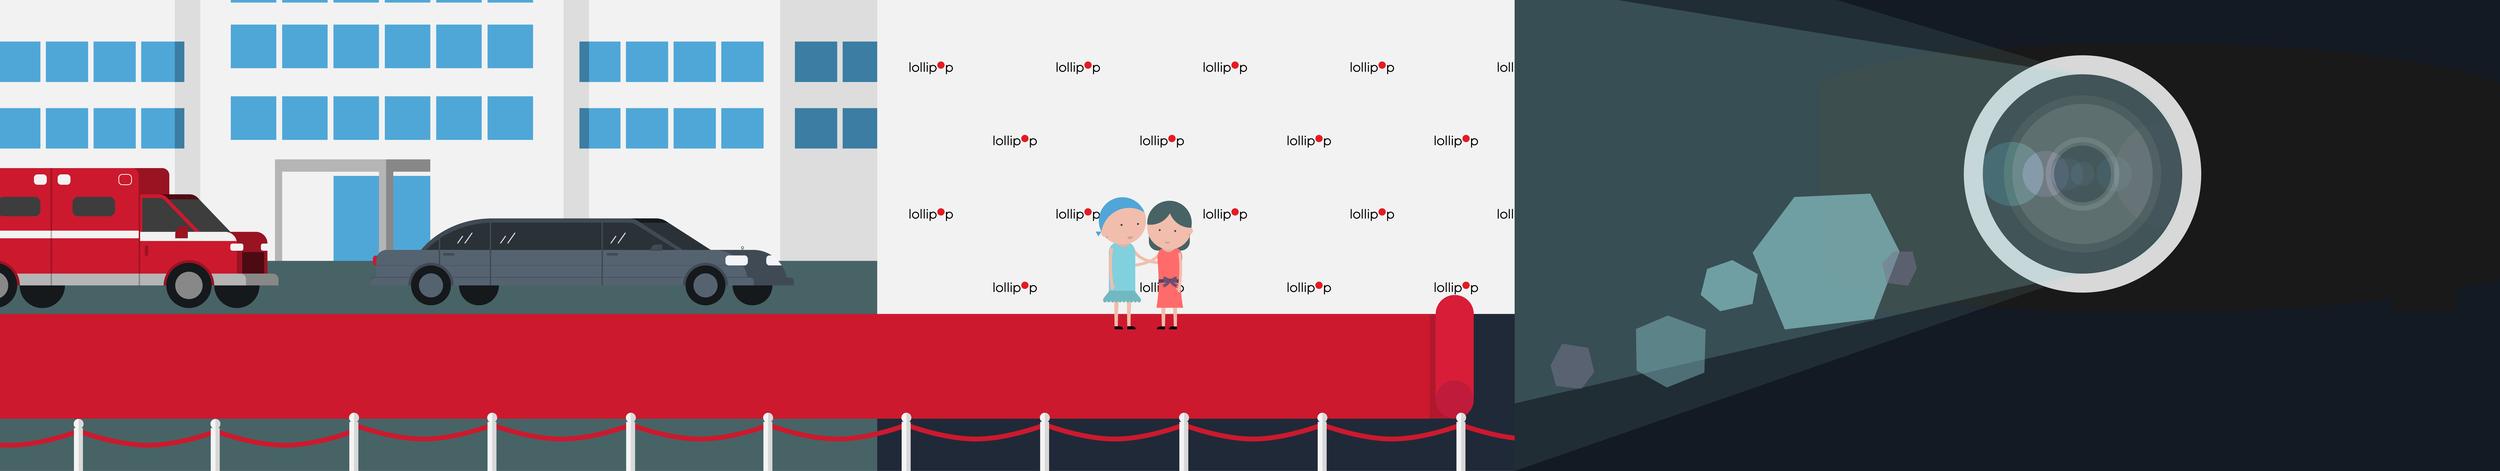 Lollipop_110-01.jpg